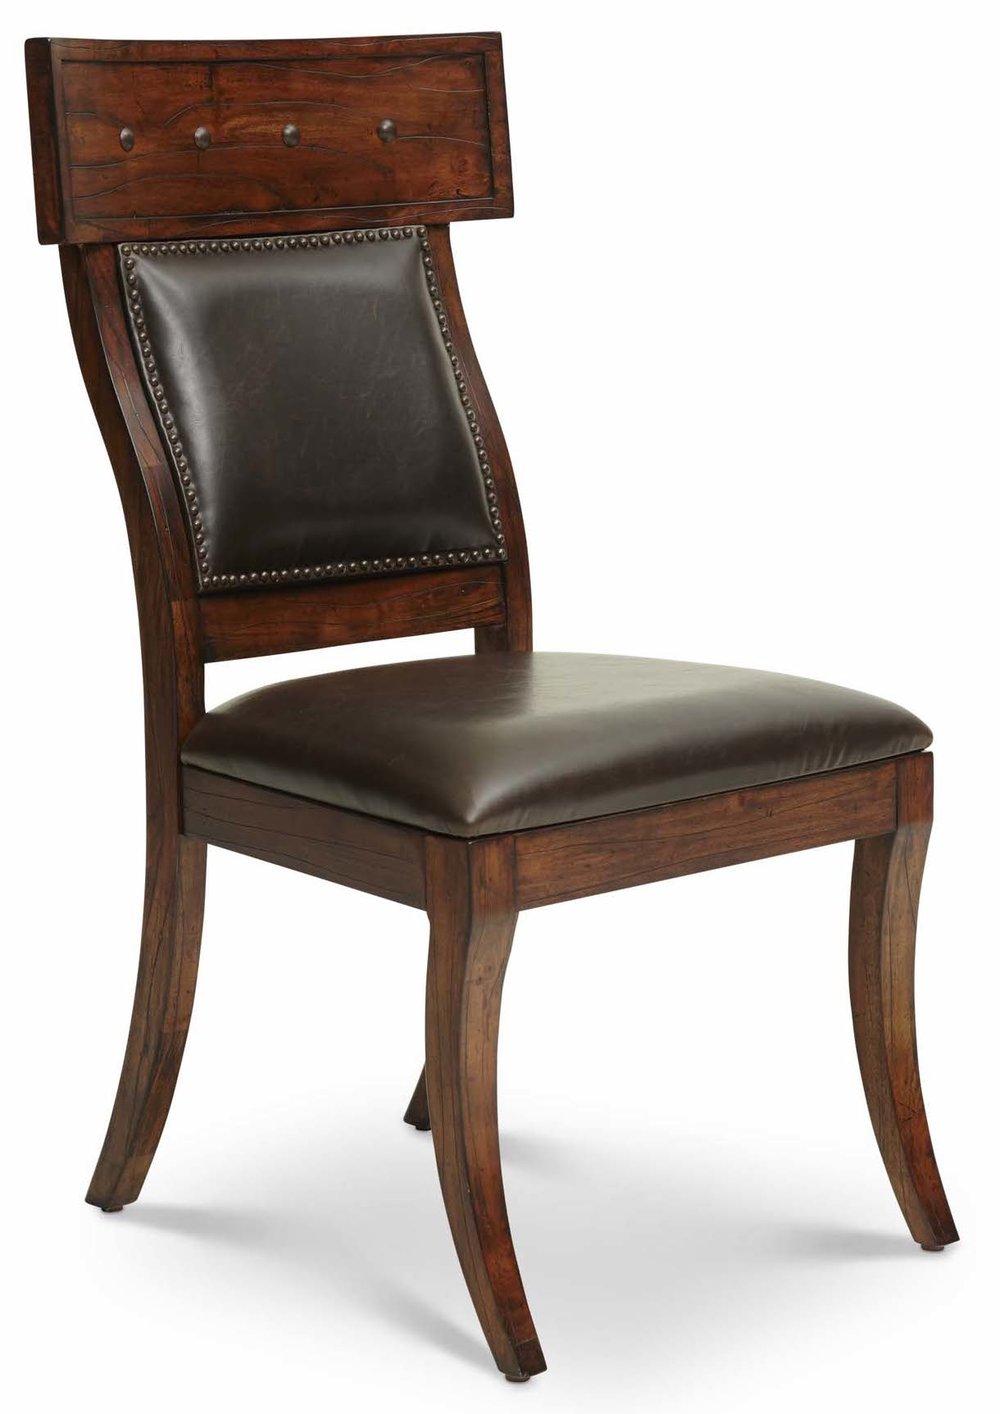 "Aspen Side Chair Upholstered Back  Item # DI-167205A (G / LB / DB) Dimensions: (2/carton)22 x 25 x 41.5""H"